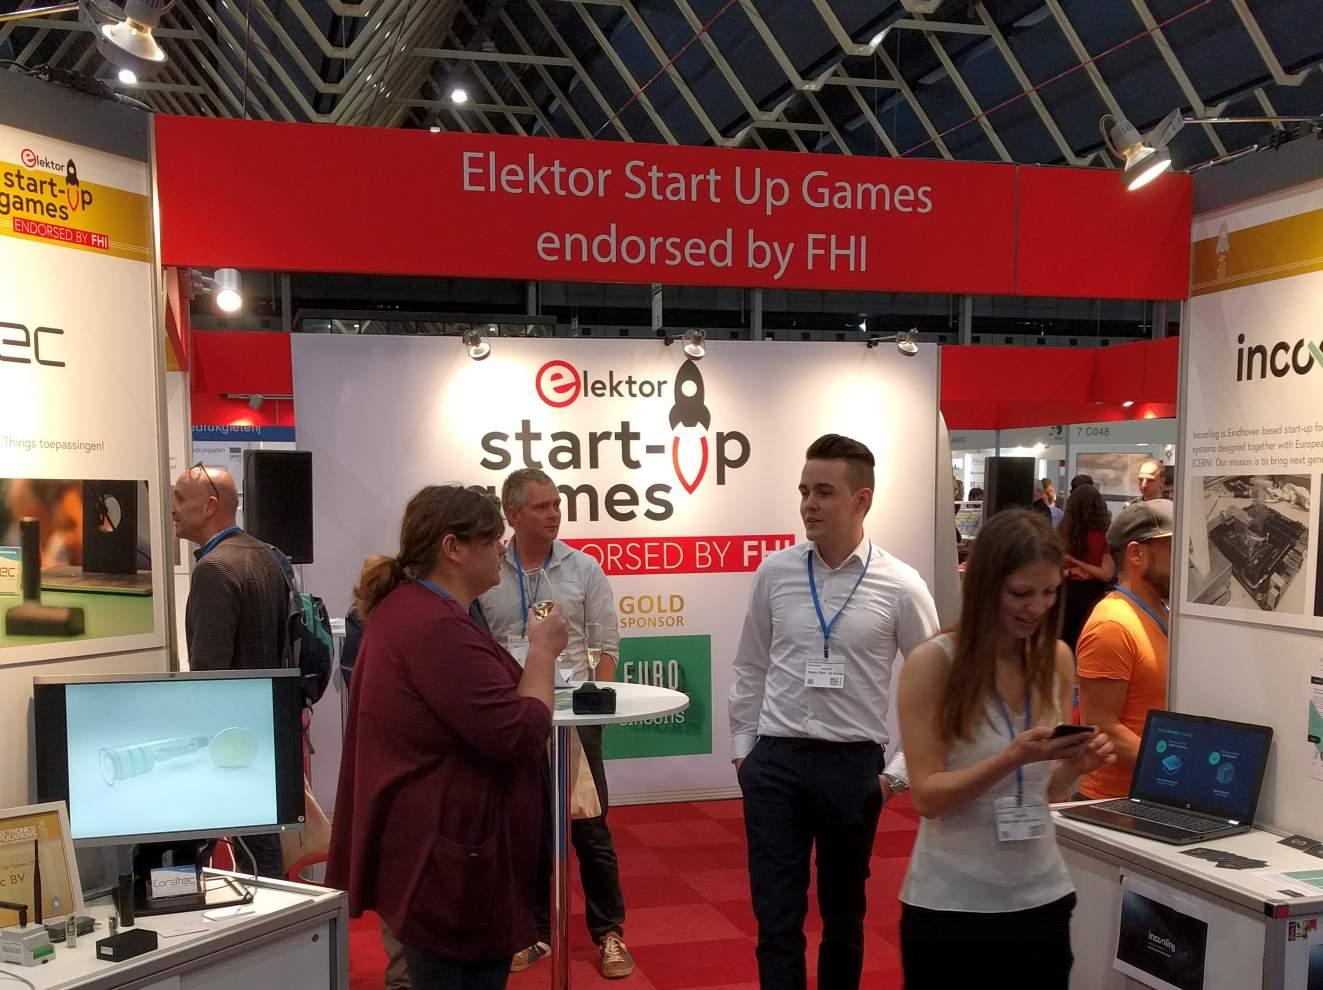 20190523125853_elektor-start-up-games-2019-s.jpg